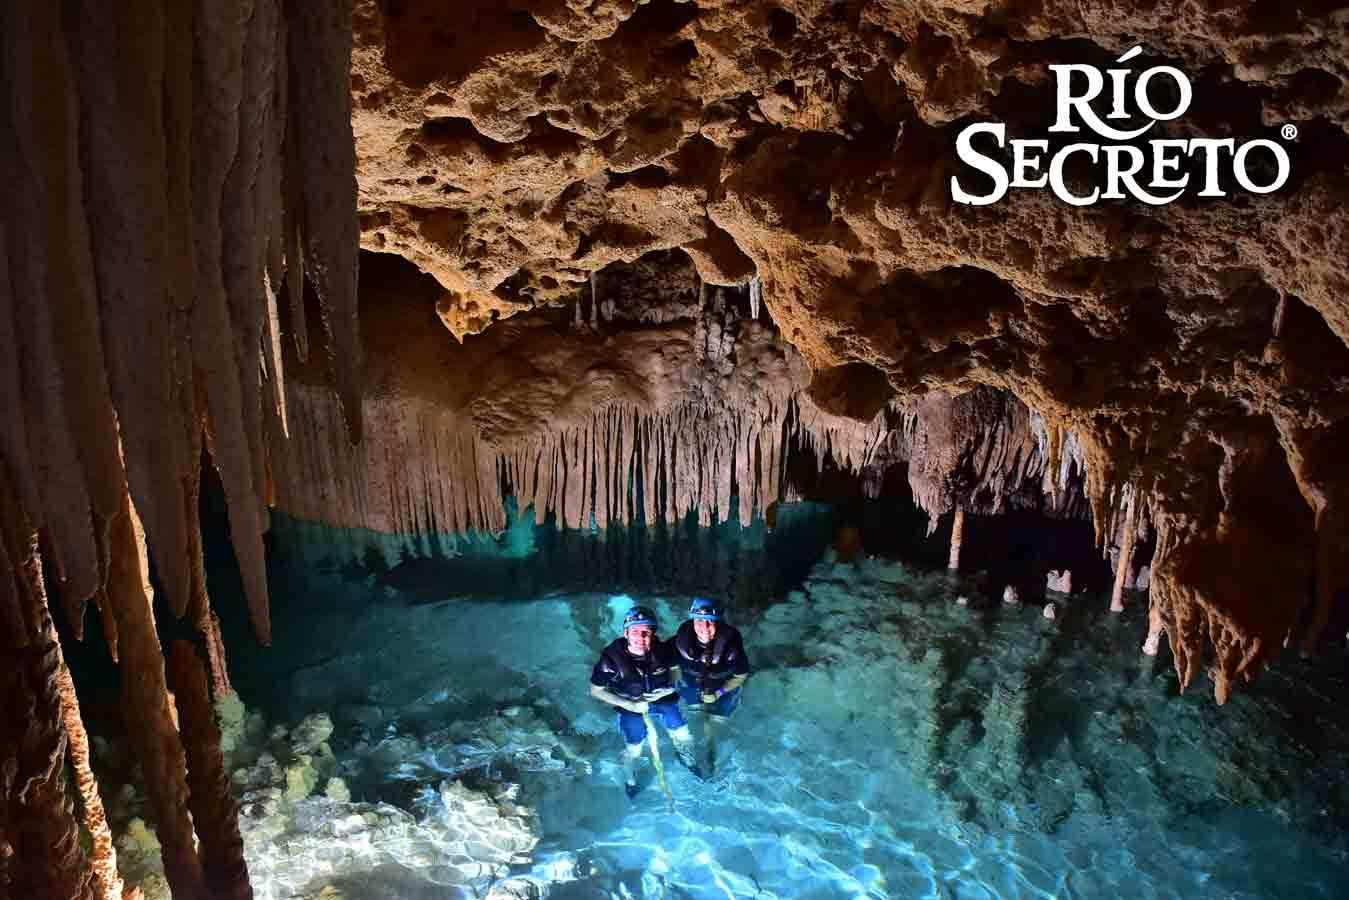 Rio Secreto Regular Tour Riviera - Last Minute Tours in Cancún and Riviera Maya